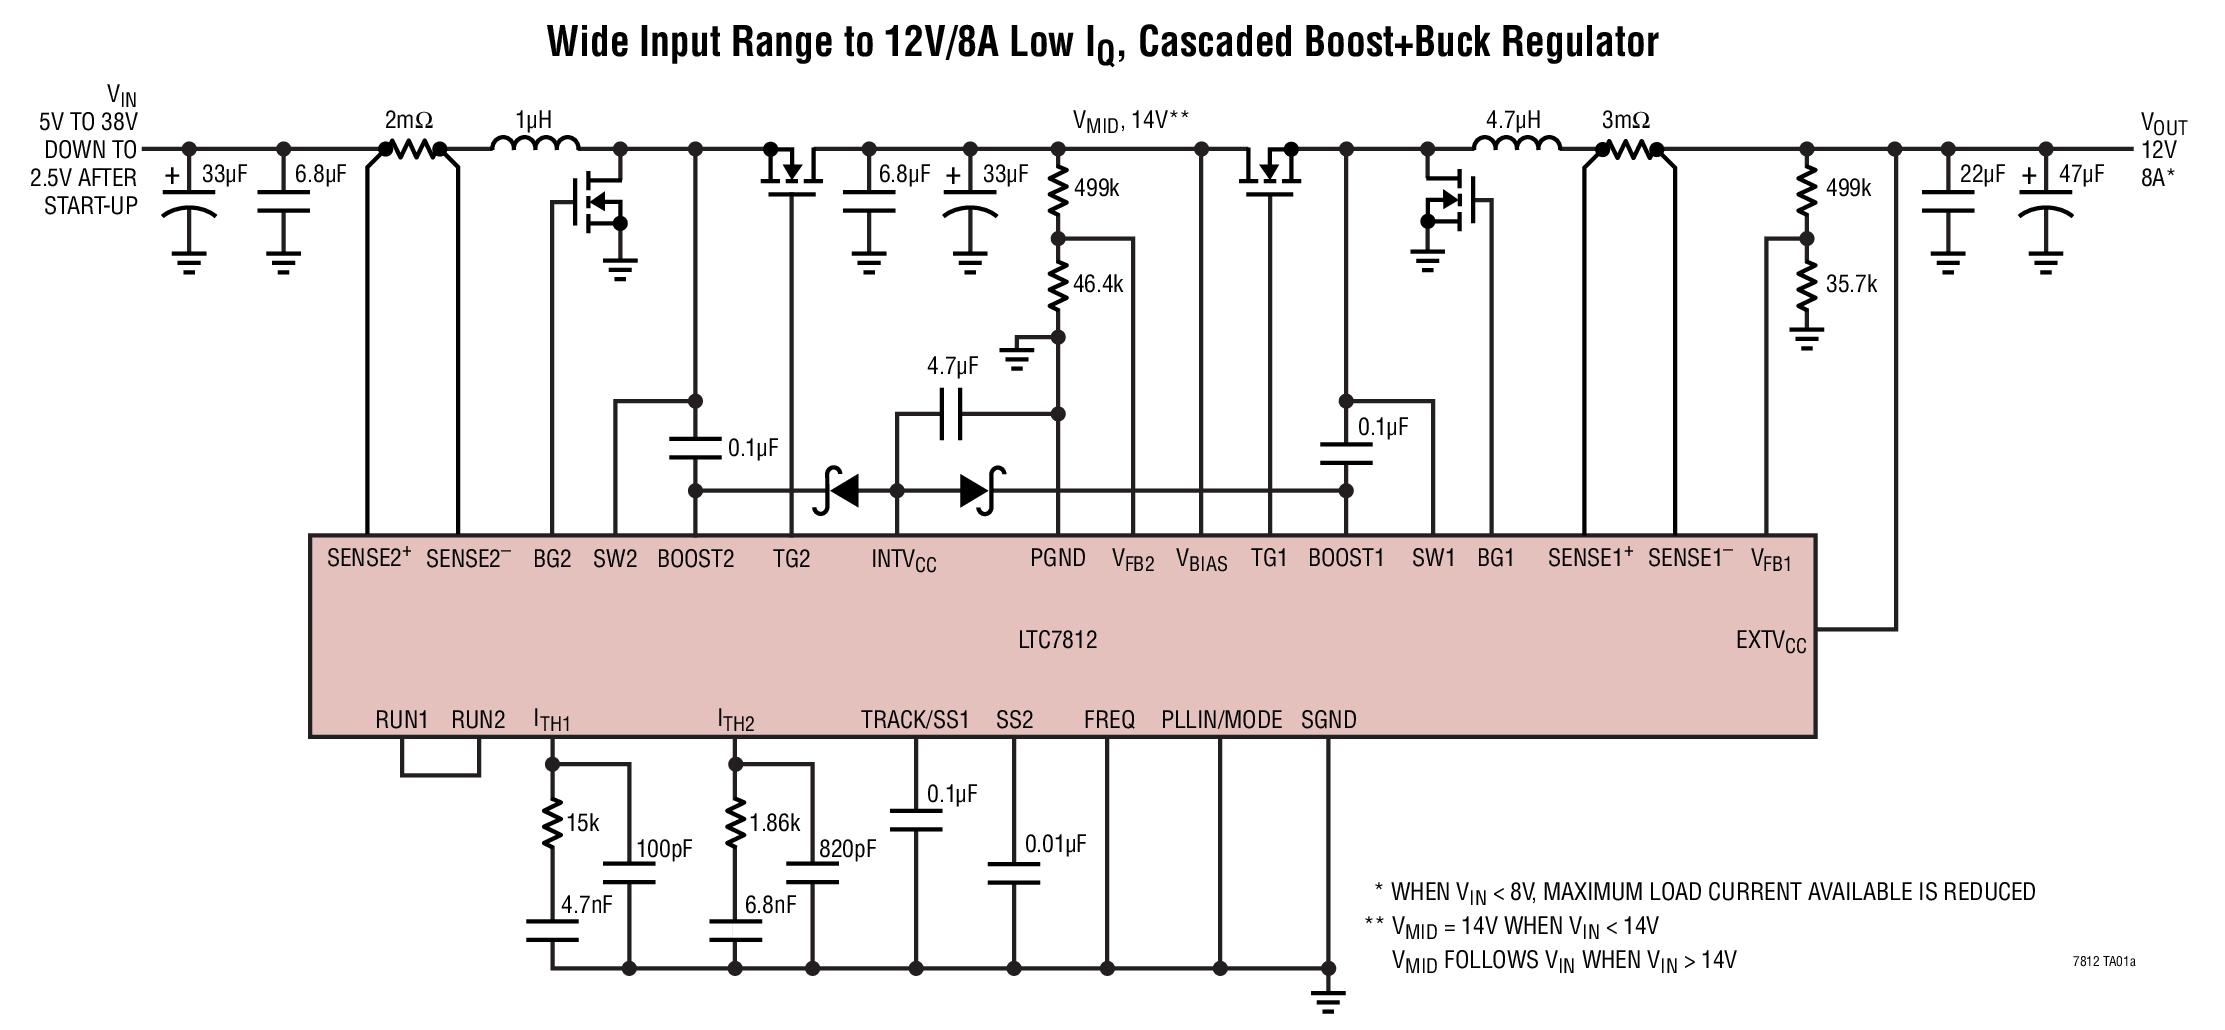 LTC7812 - Low IQ,38V Synchronous BoostBuck Controller